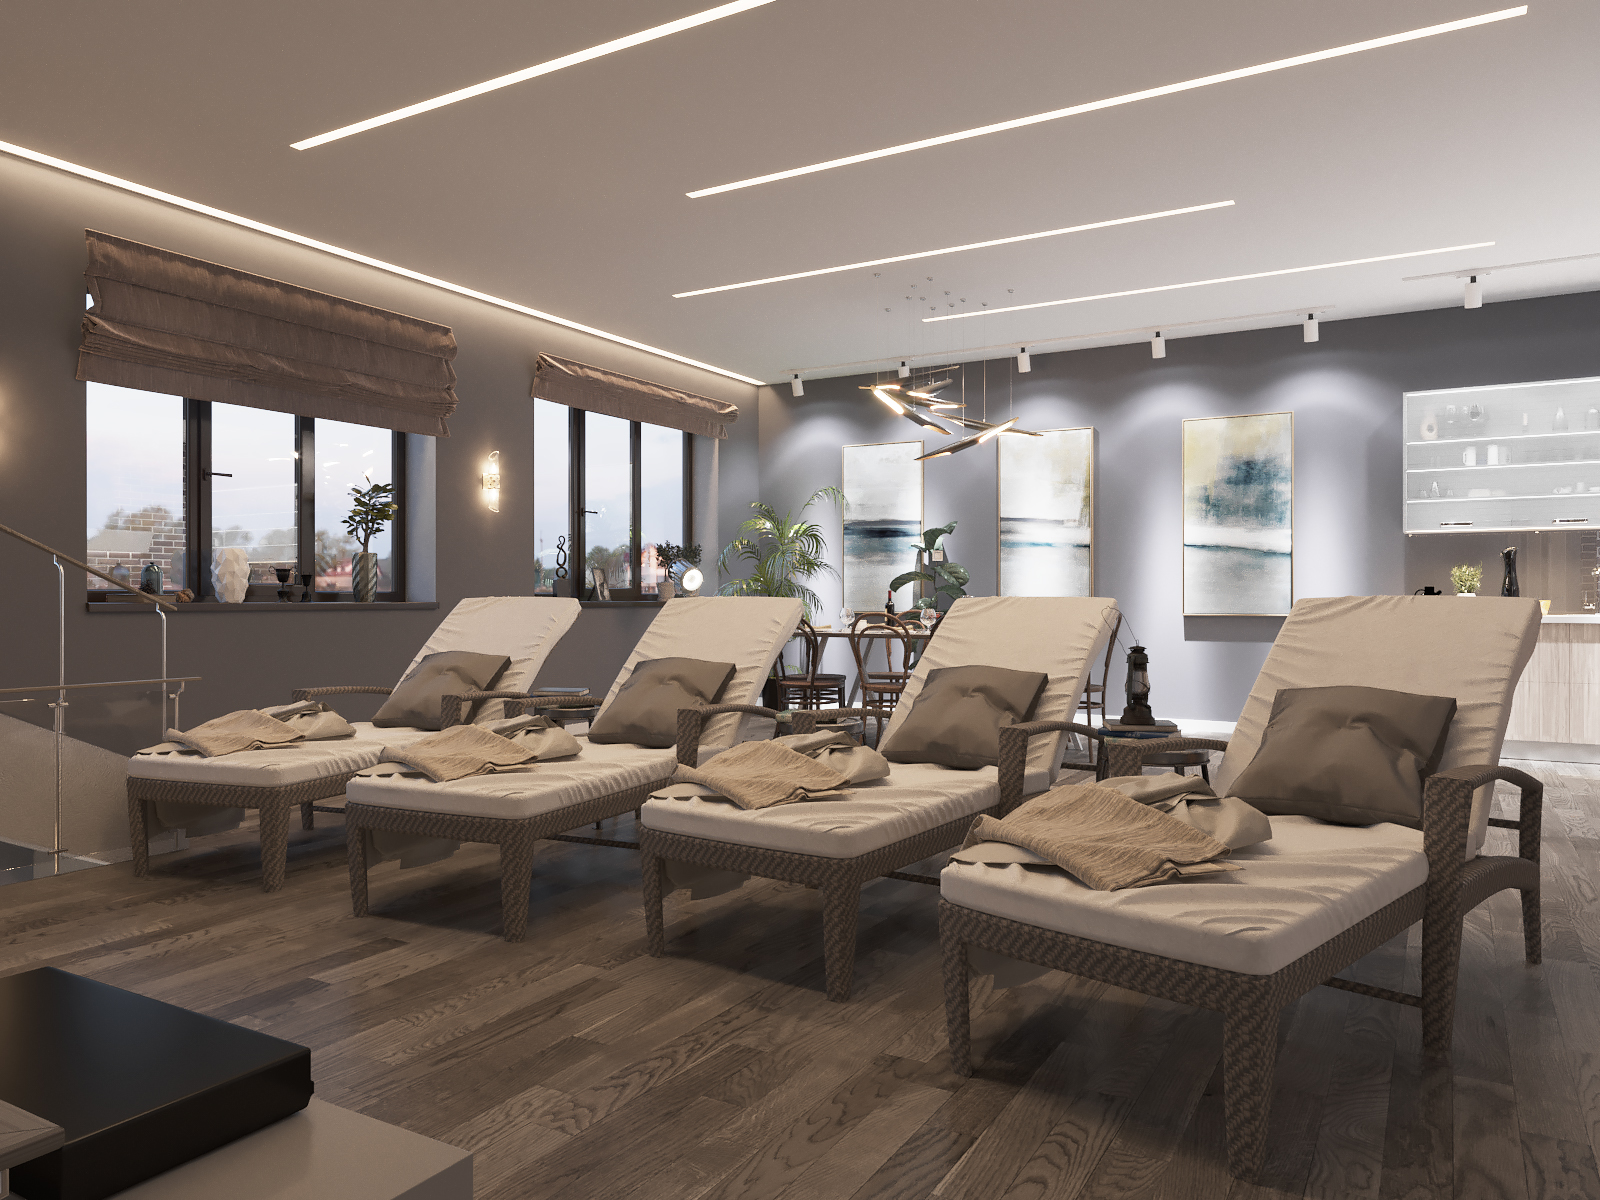 3D Vis of interior в 3d max corona render зображення